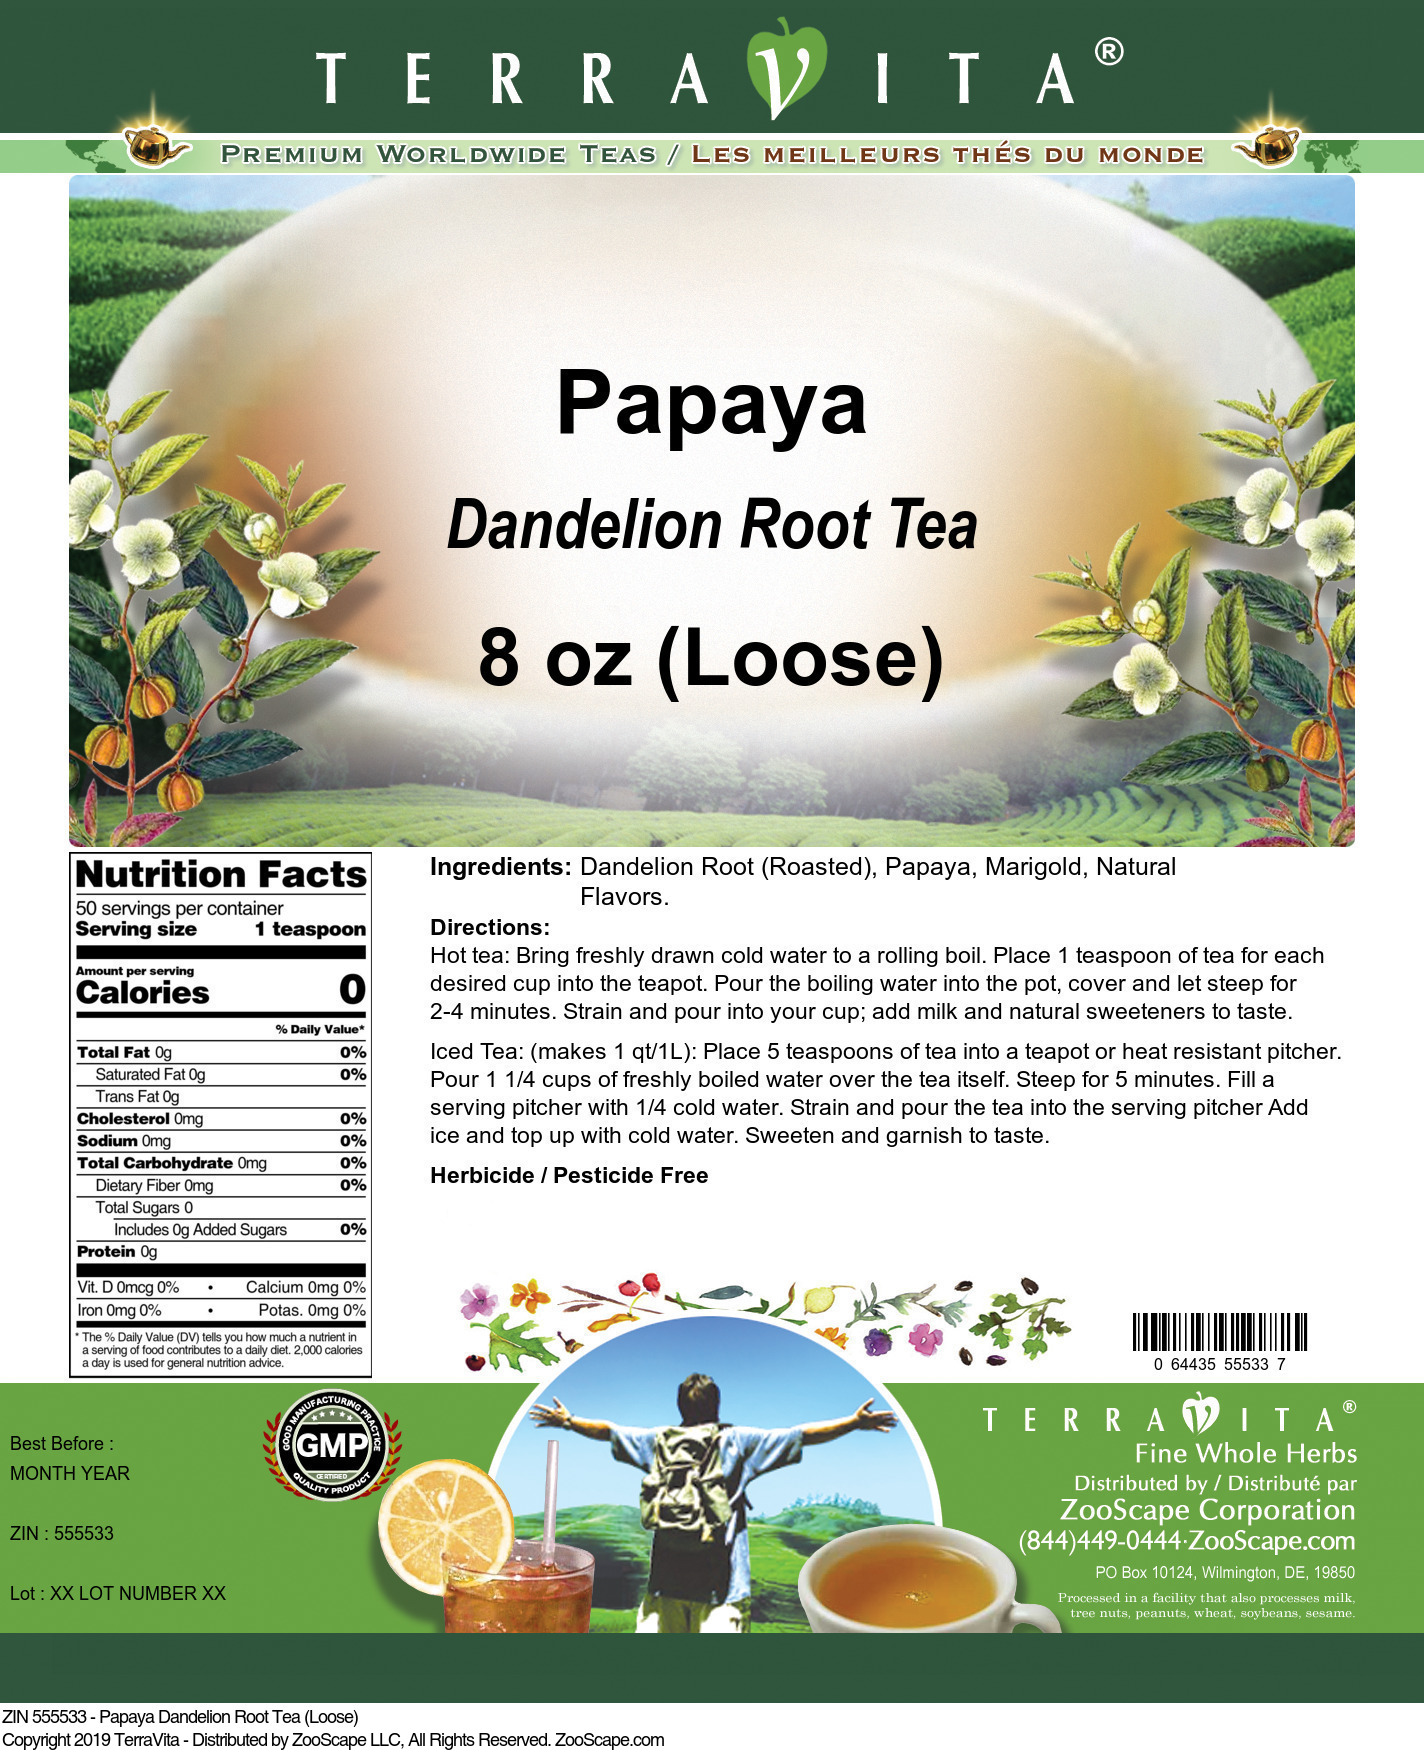 Papaya Dandelion Root